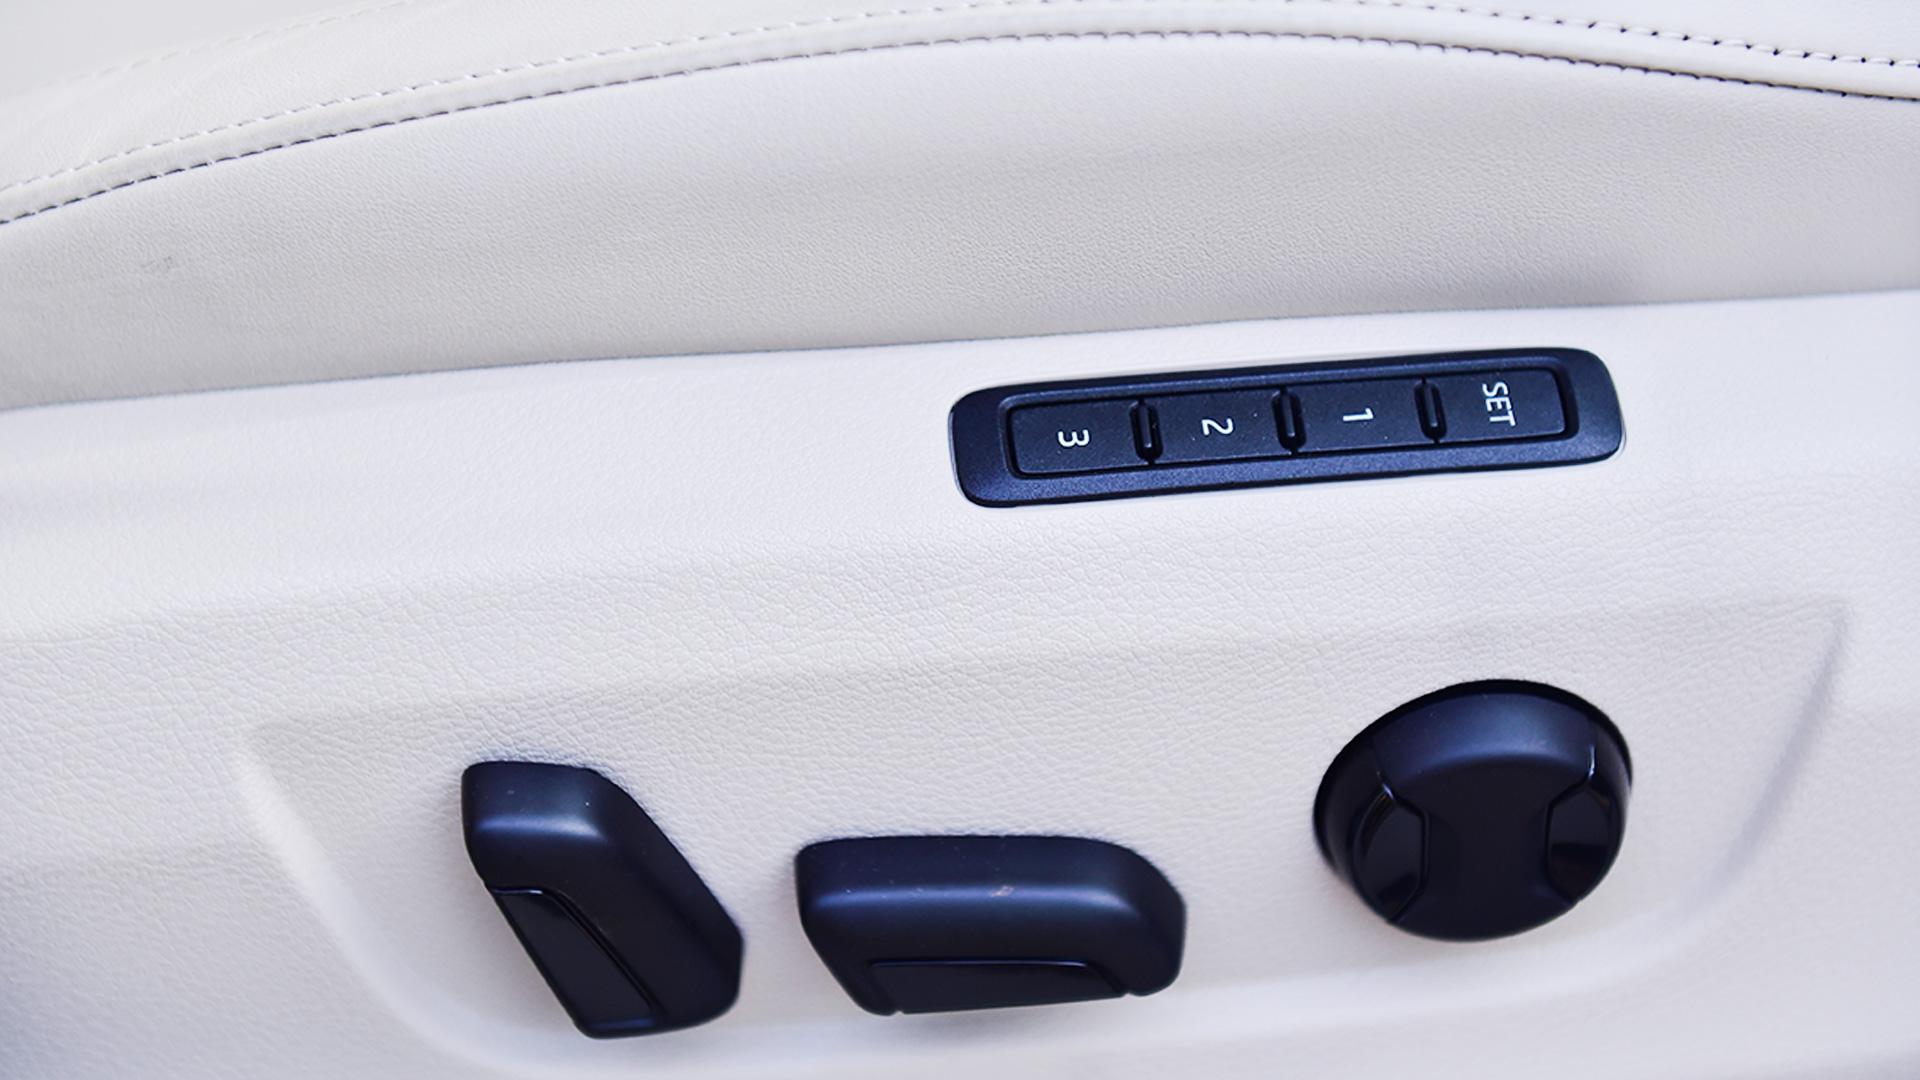 Skoda Superb 2016 2.0 TDI (AT) Style Interior